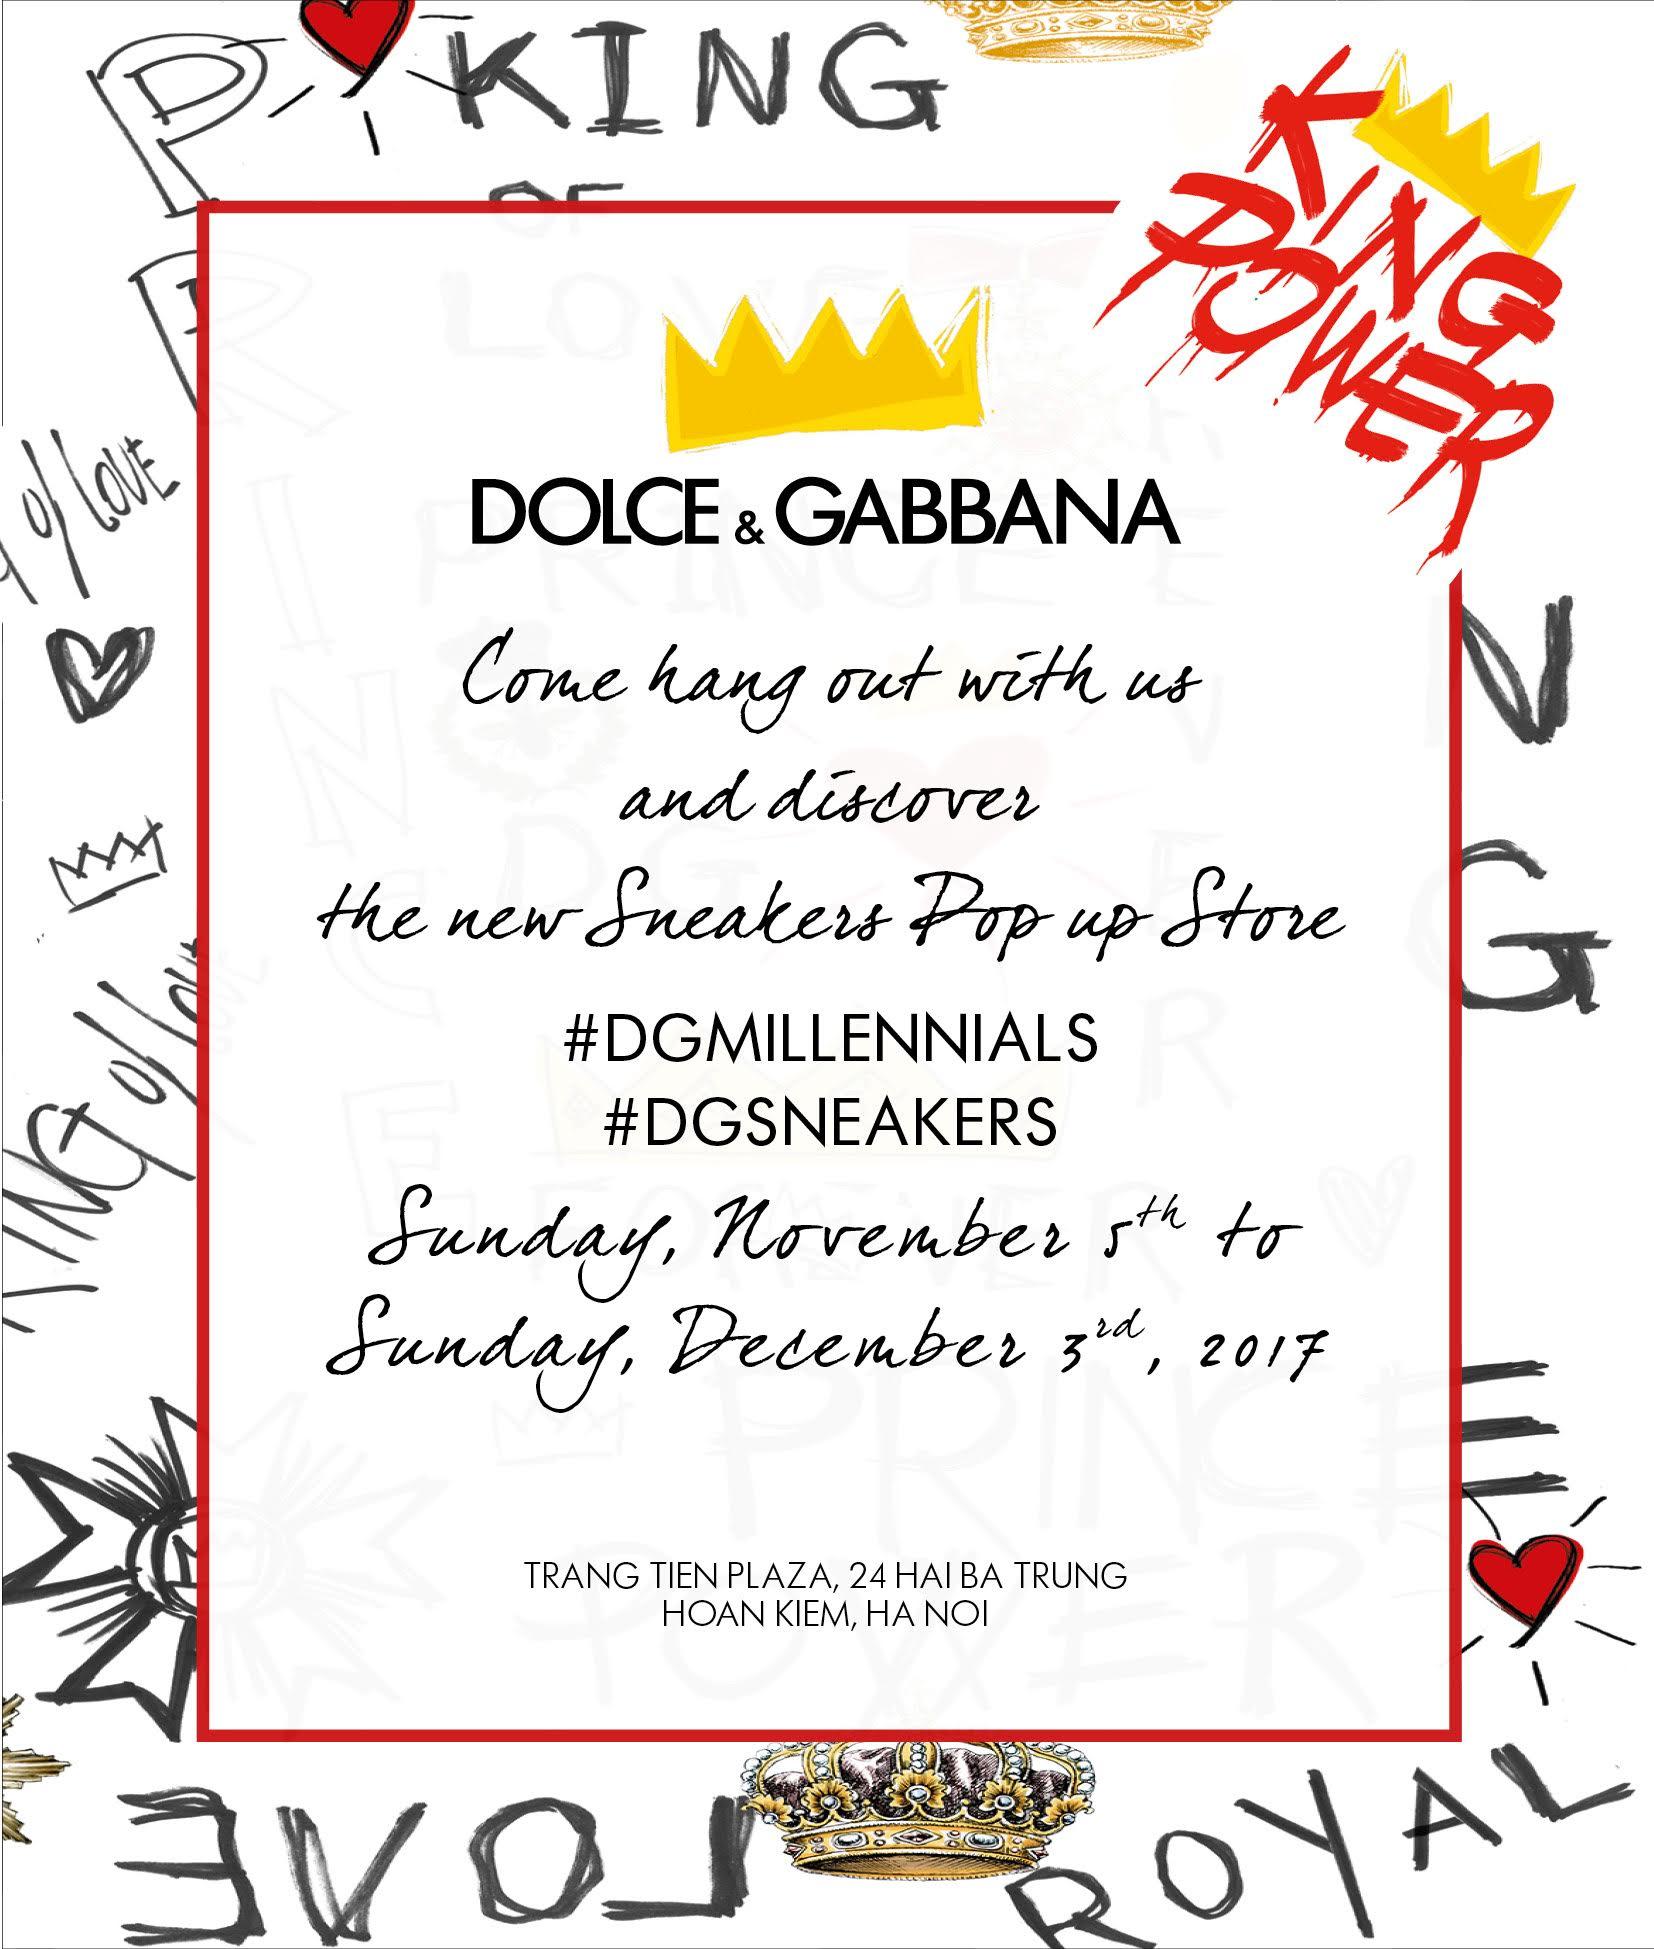 sneaker pop-up store cua dolce & Gabbana 09